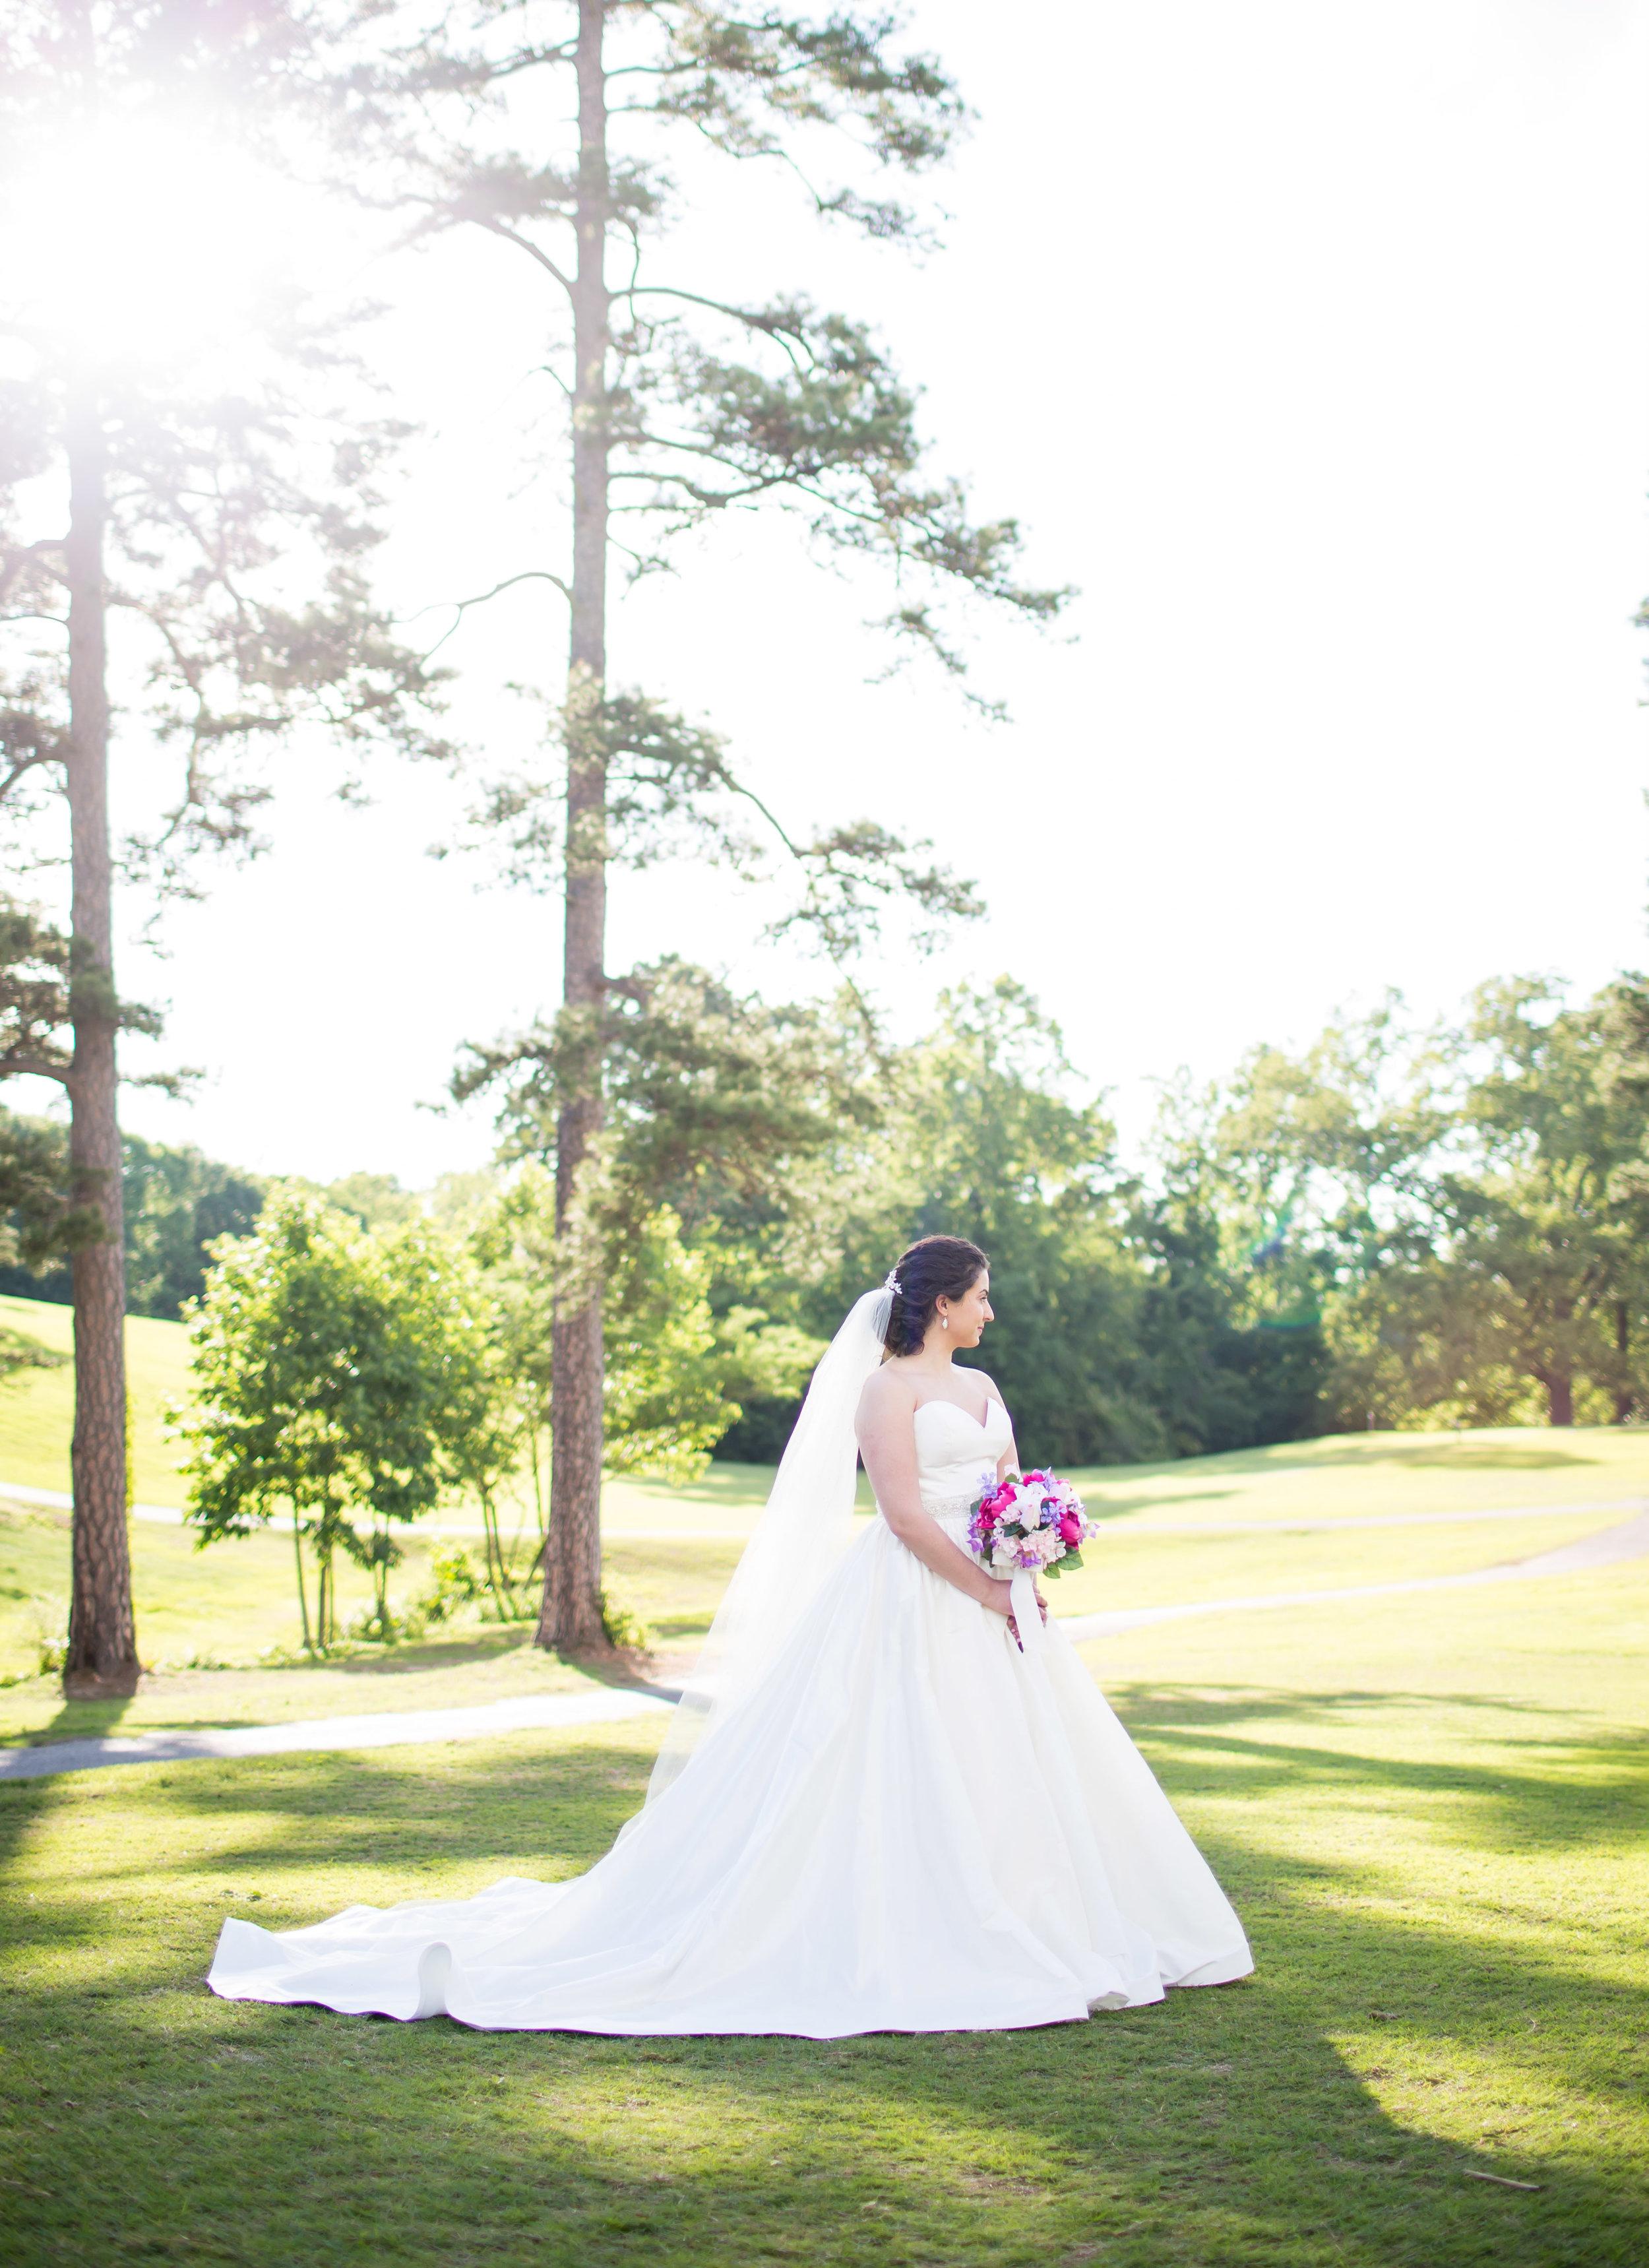 bridal (12 of 26).jpg